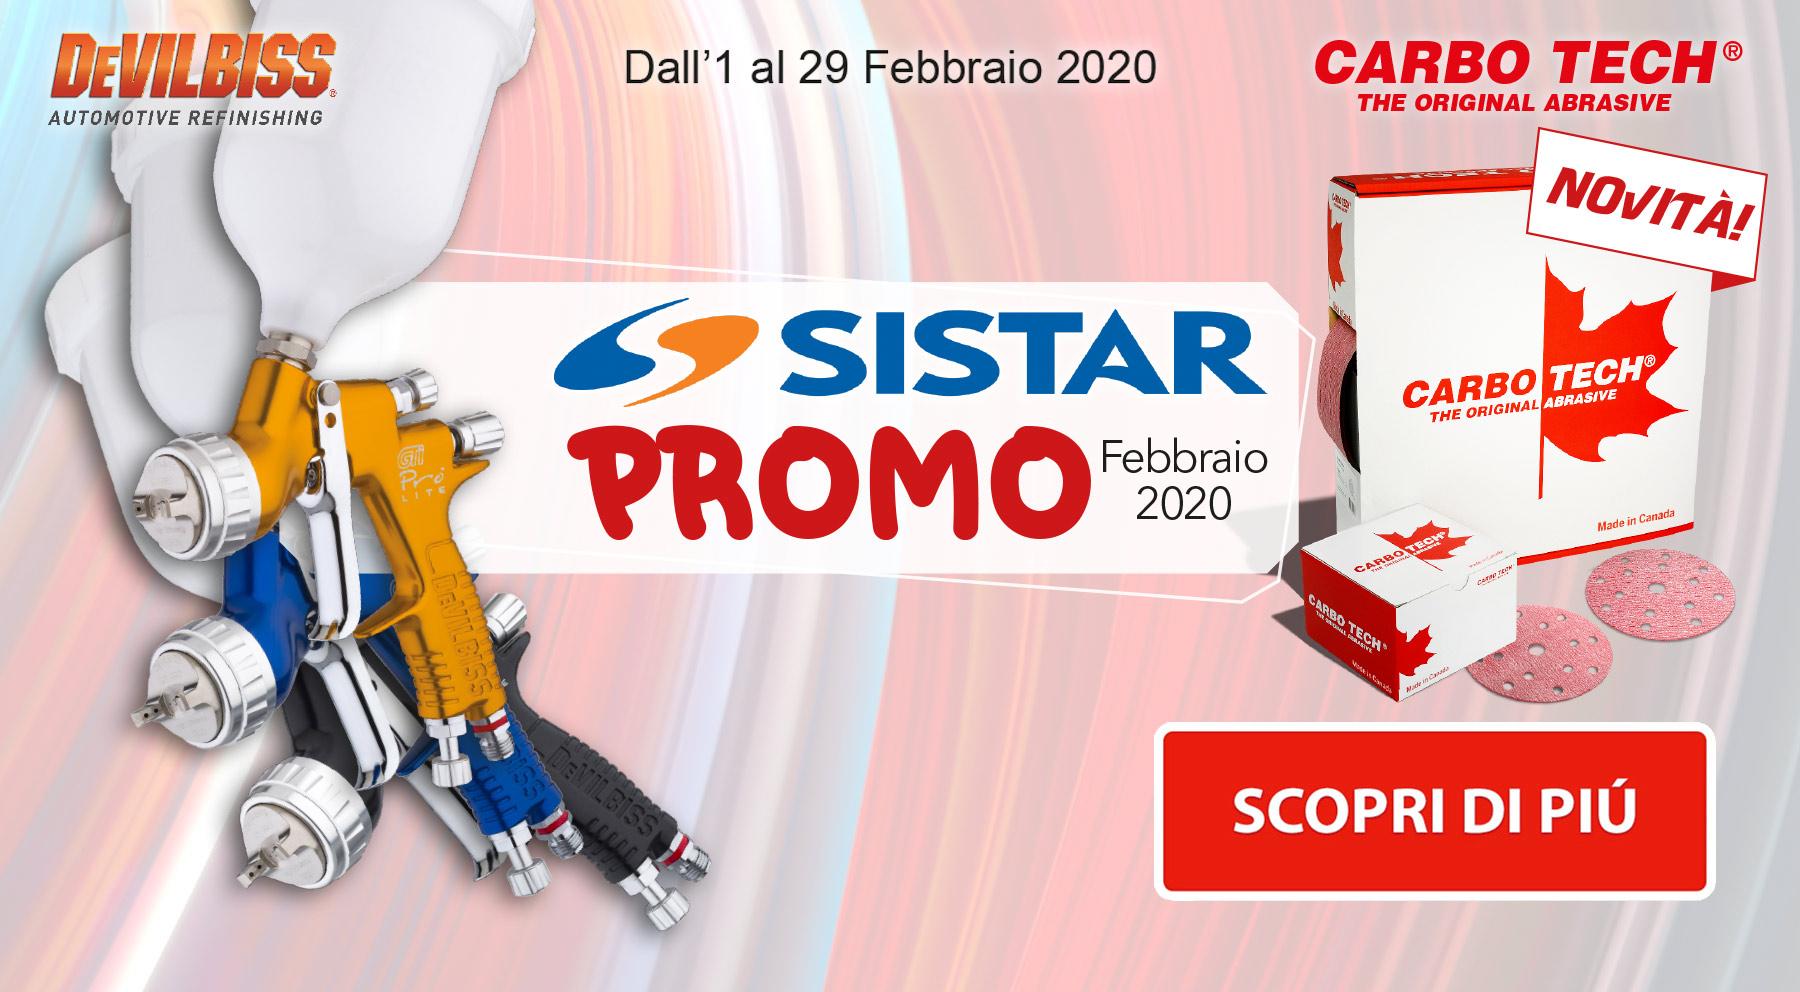 Sistar-promo-feb-2020